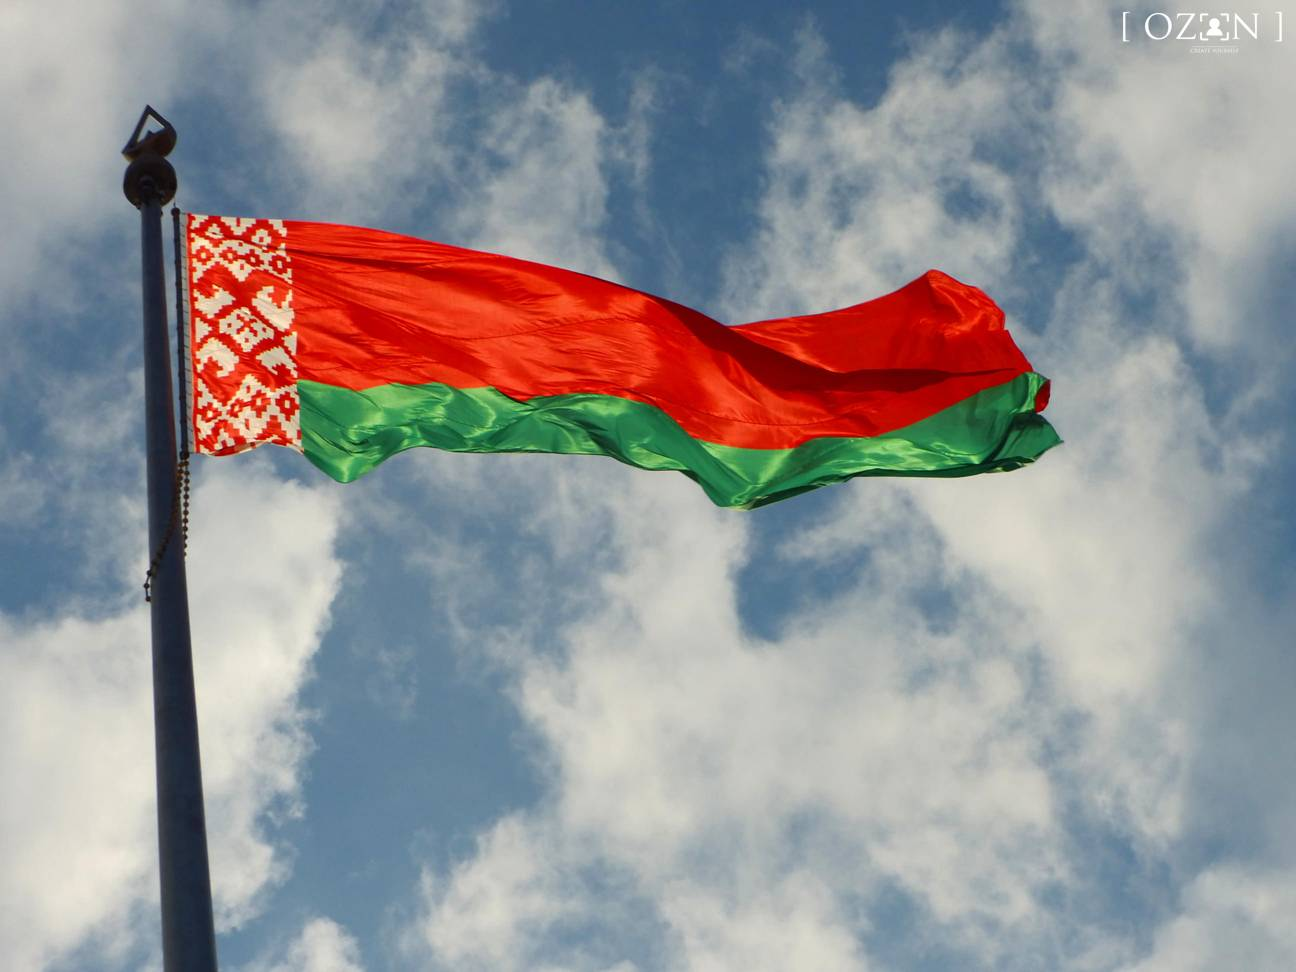 Flag_Respubliki_Belarus.jpg